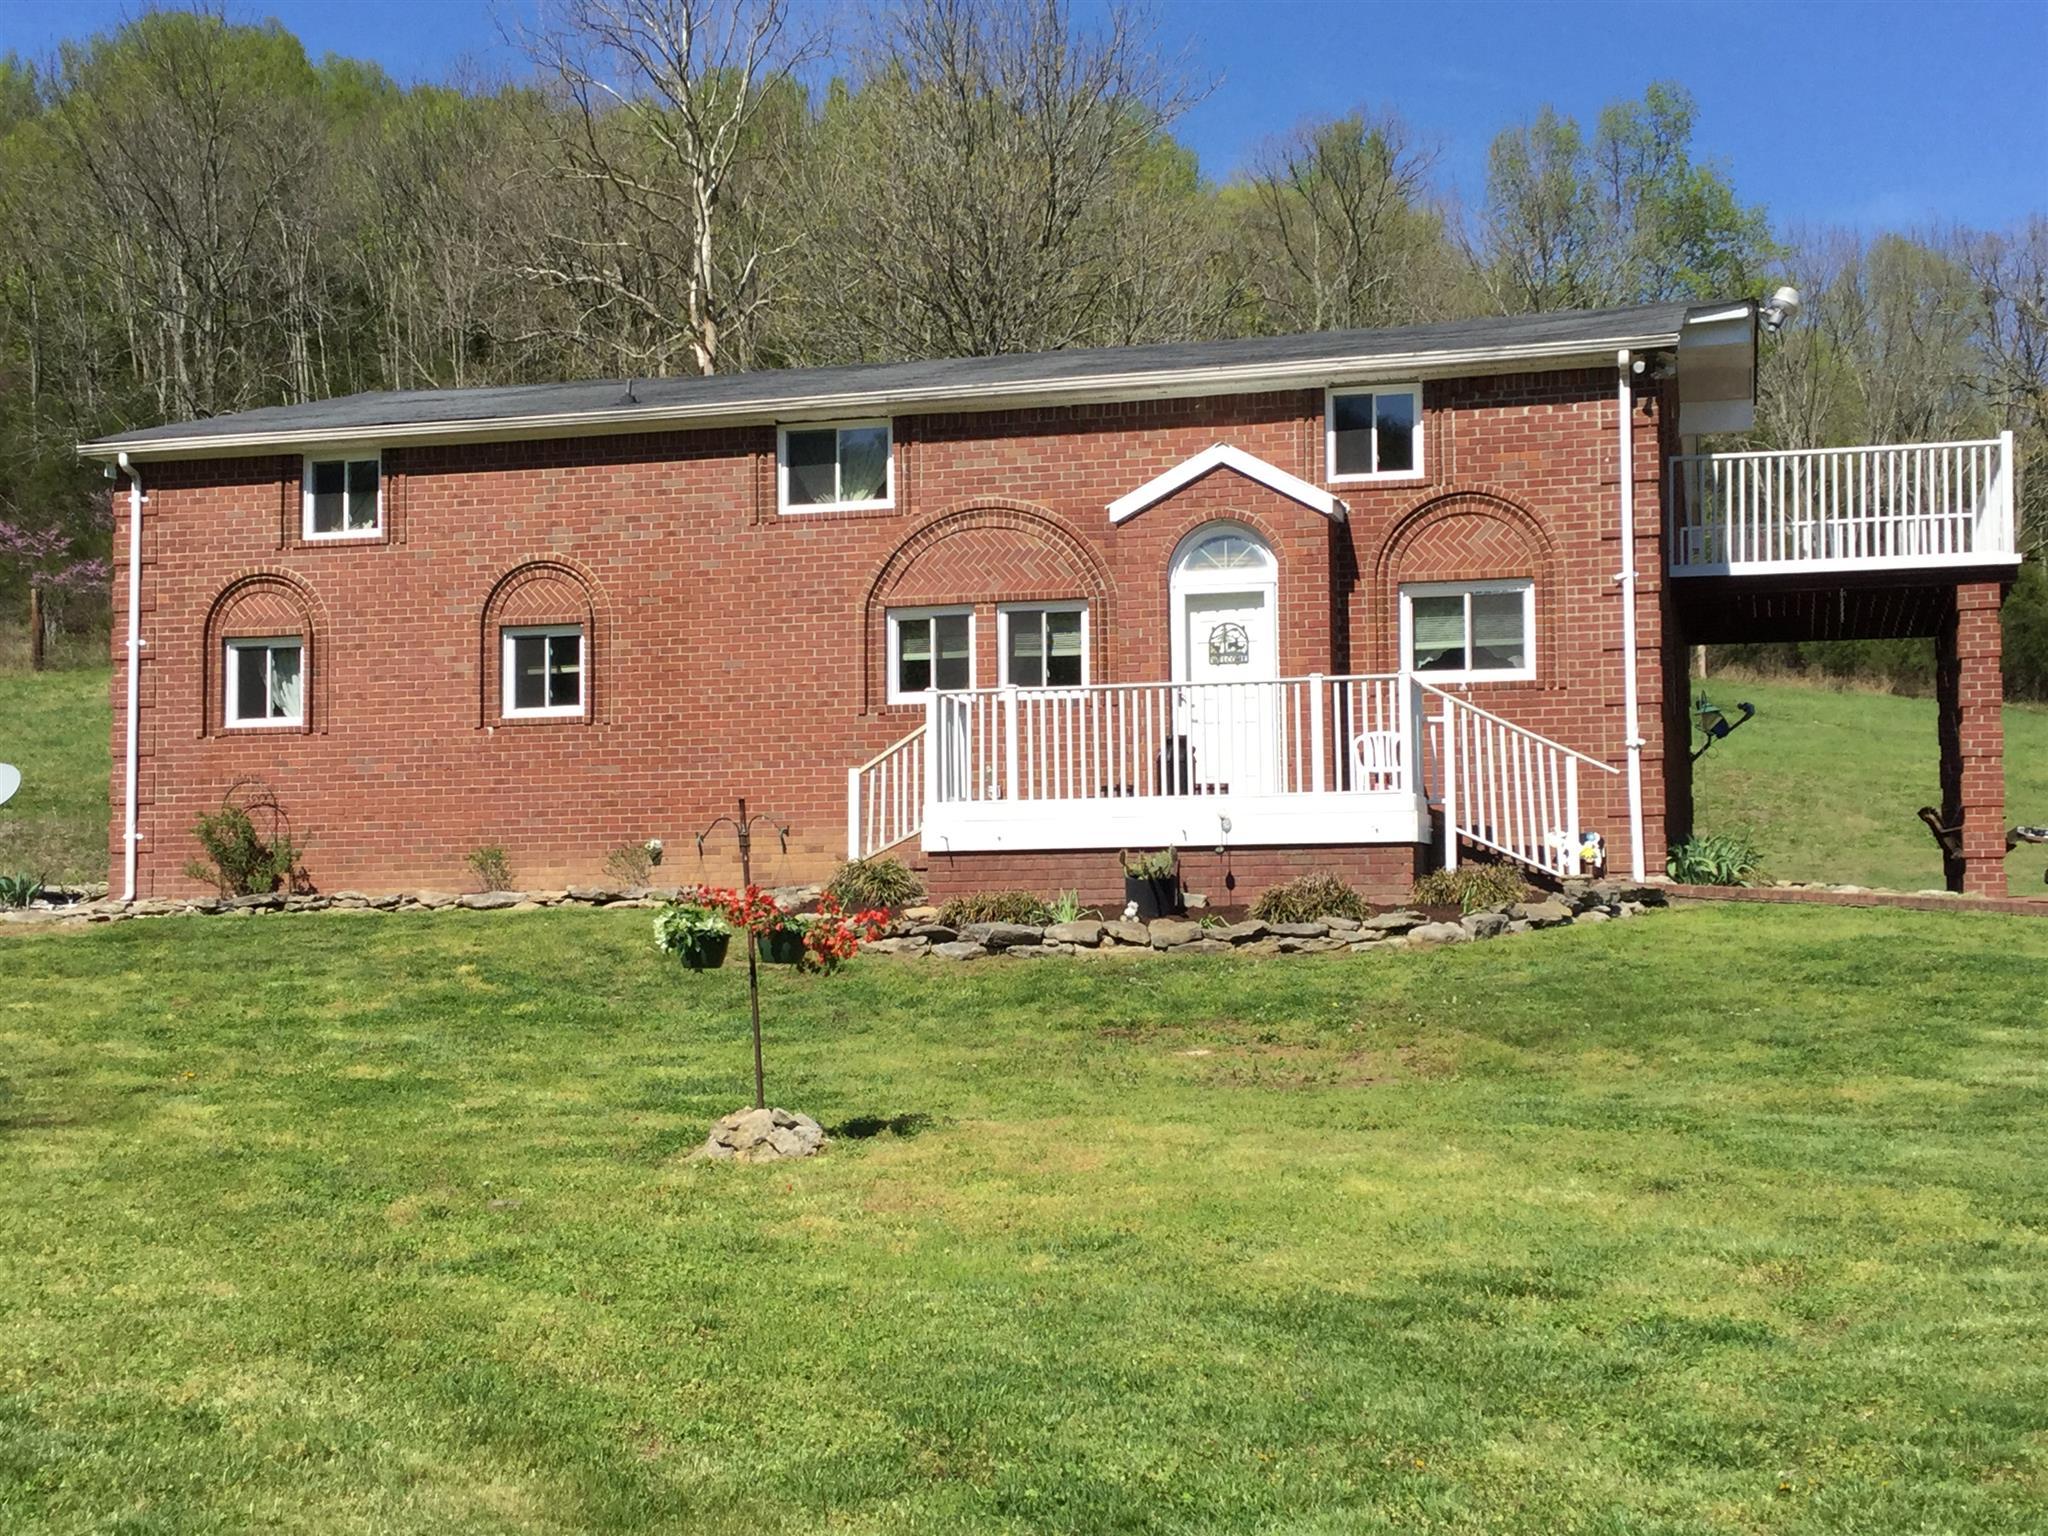 630 Scruggs Ln, Hartsville, TN 37074 - Hartsville, TN real estate listing